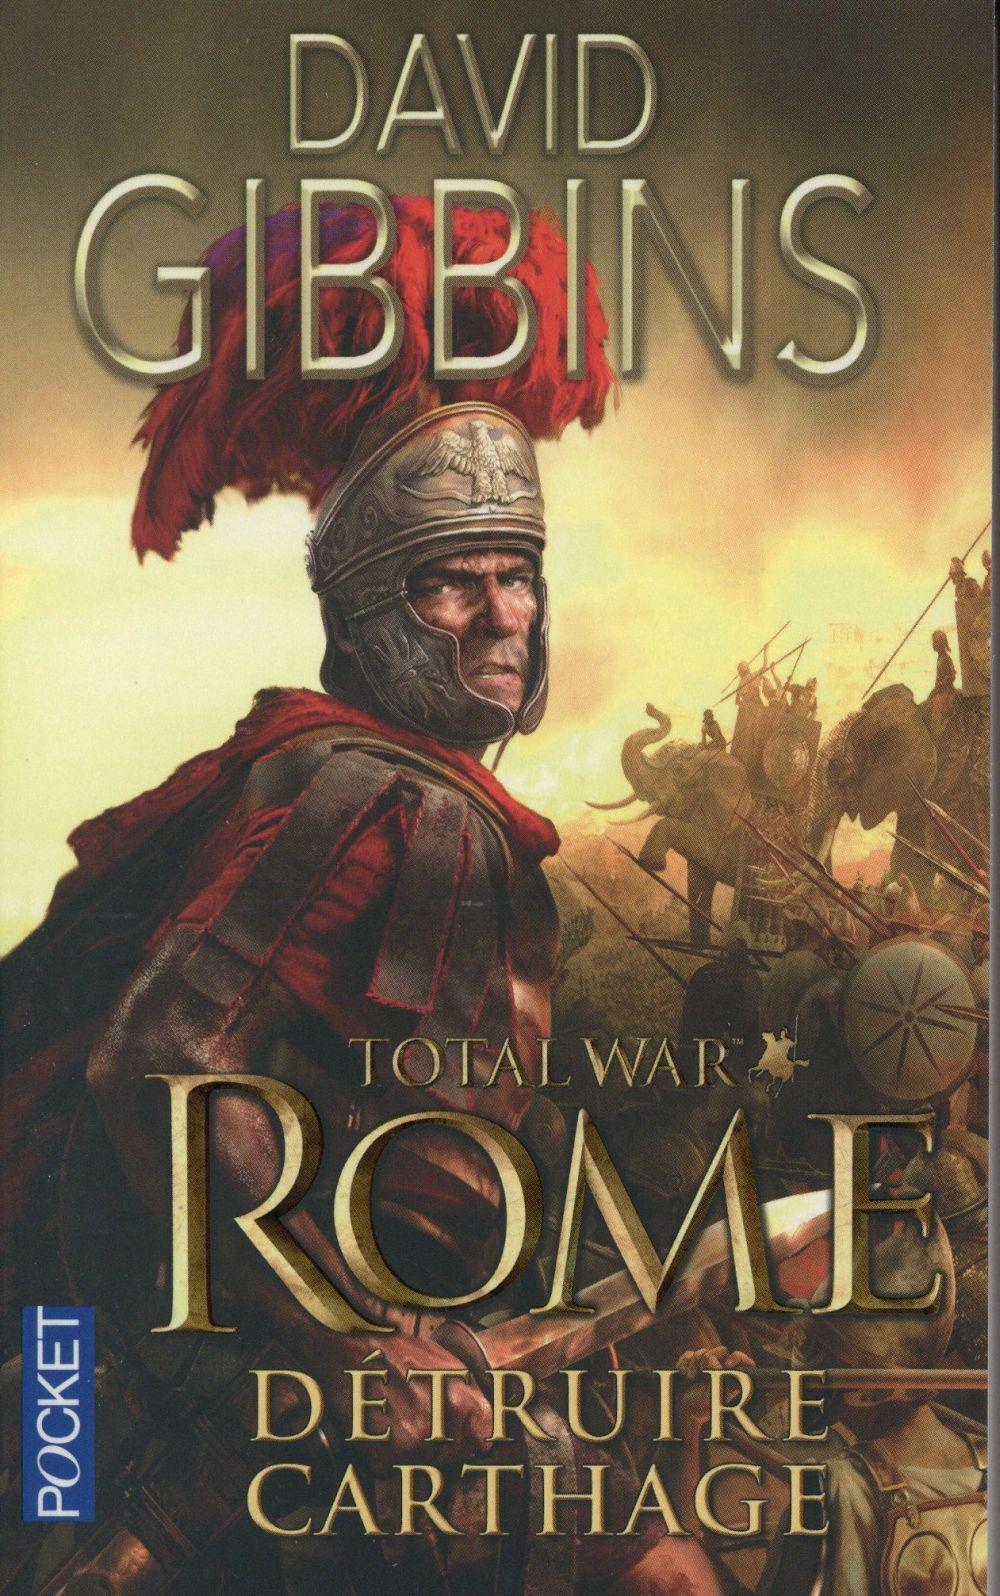 Total War Rome ; Detruire Carthage